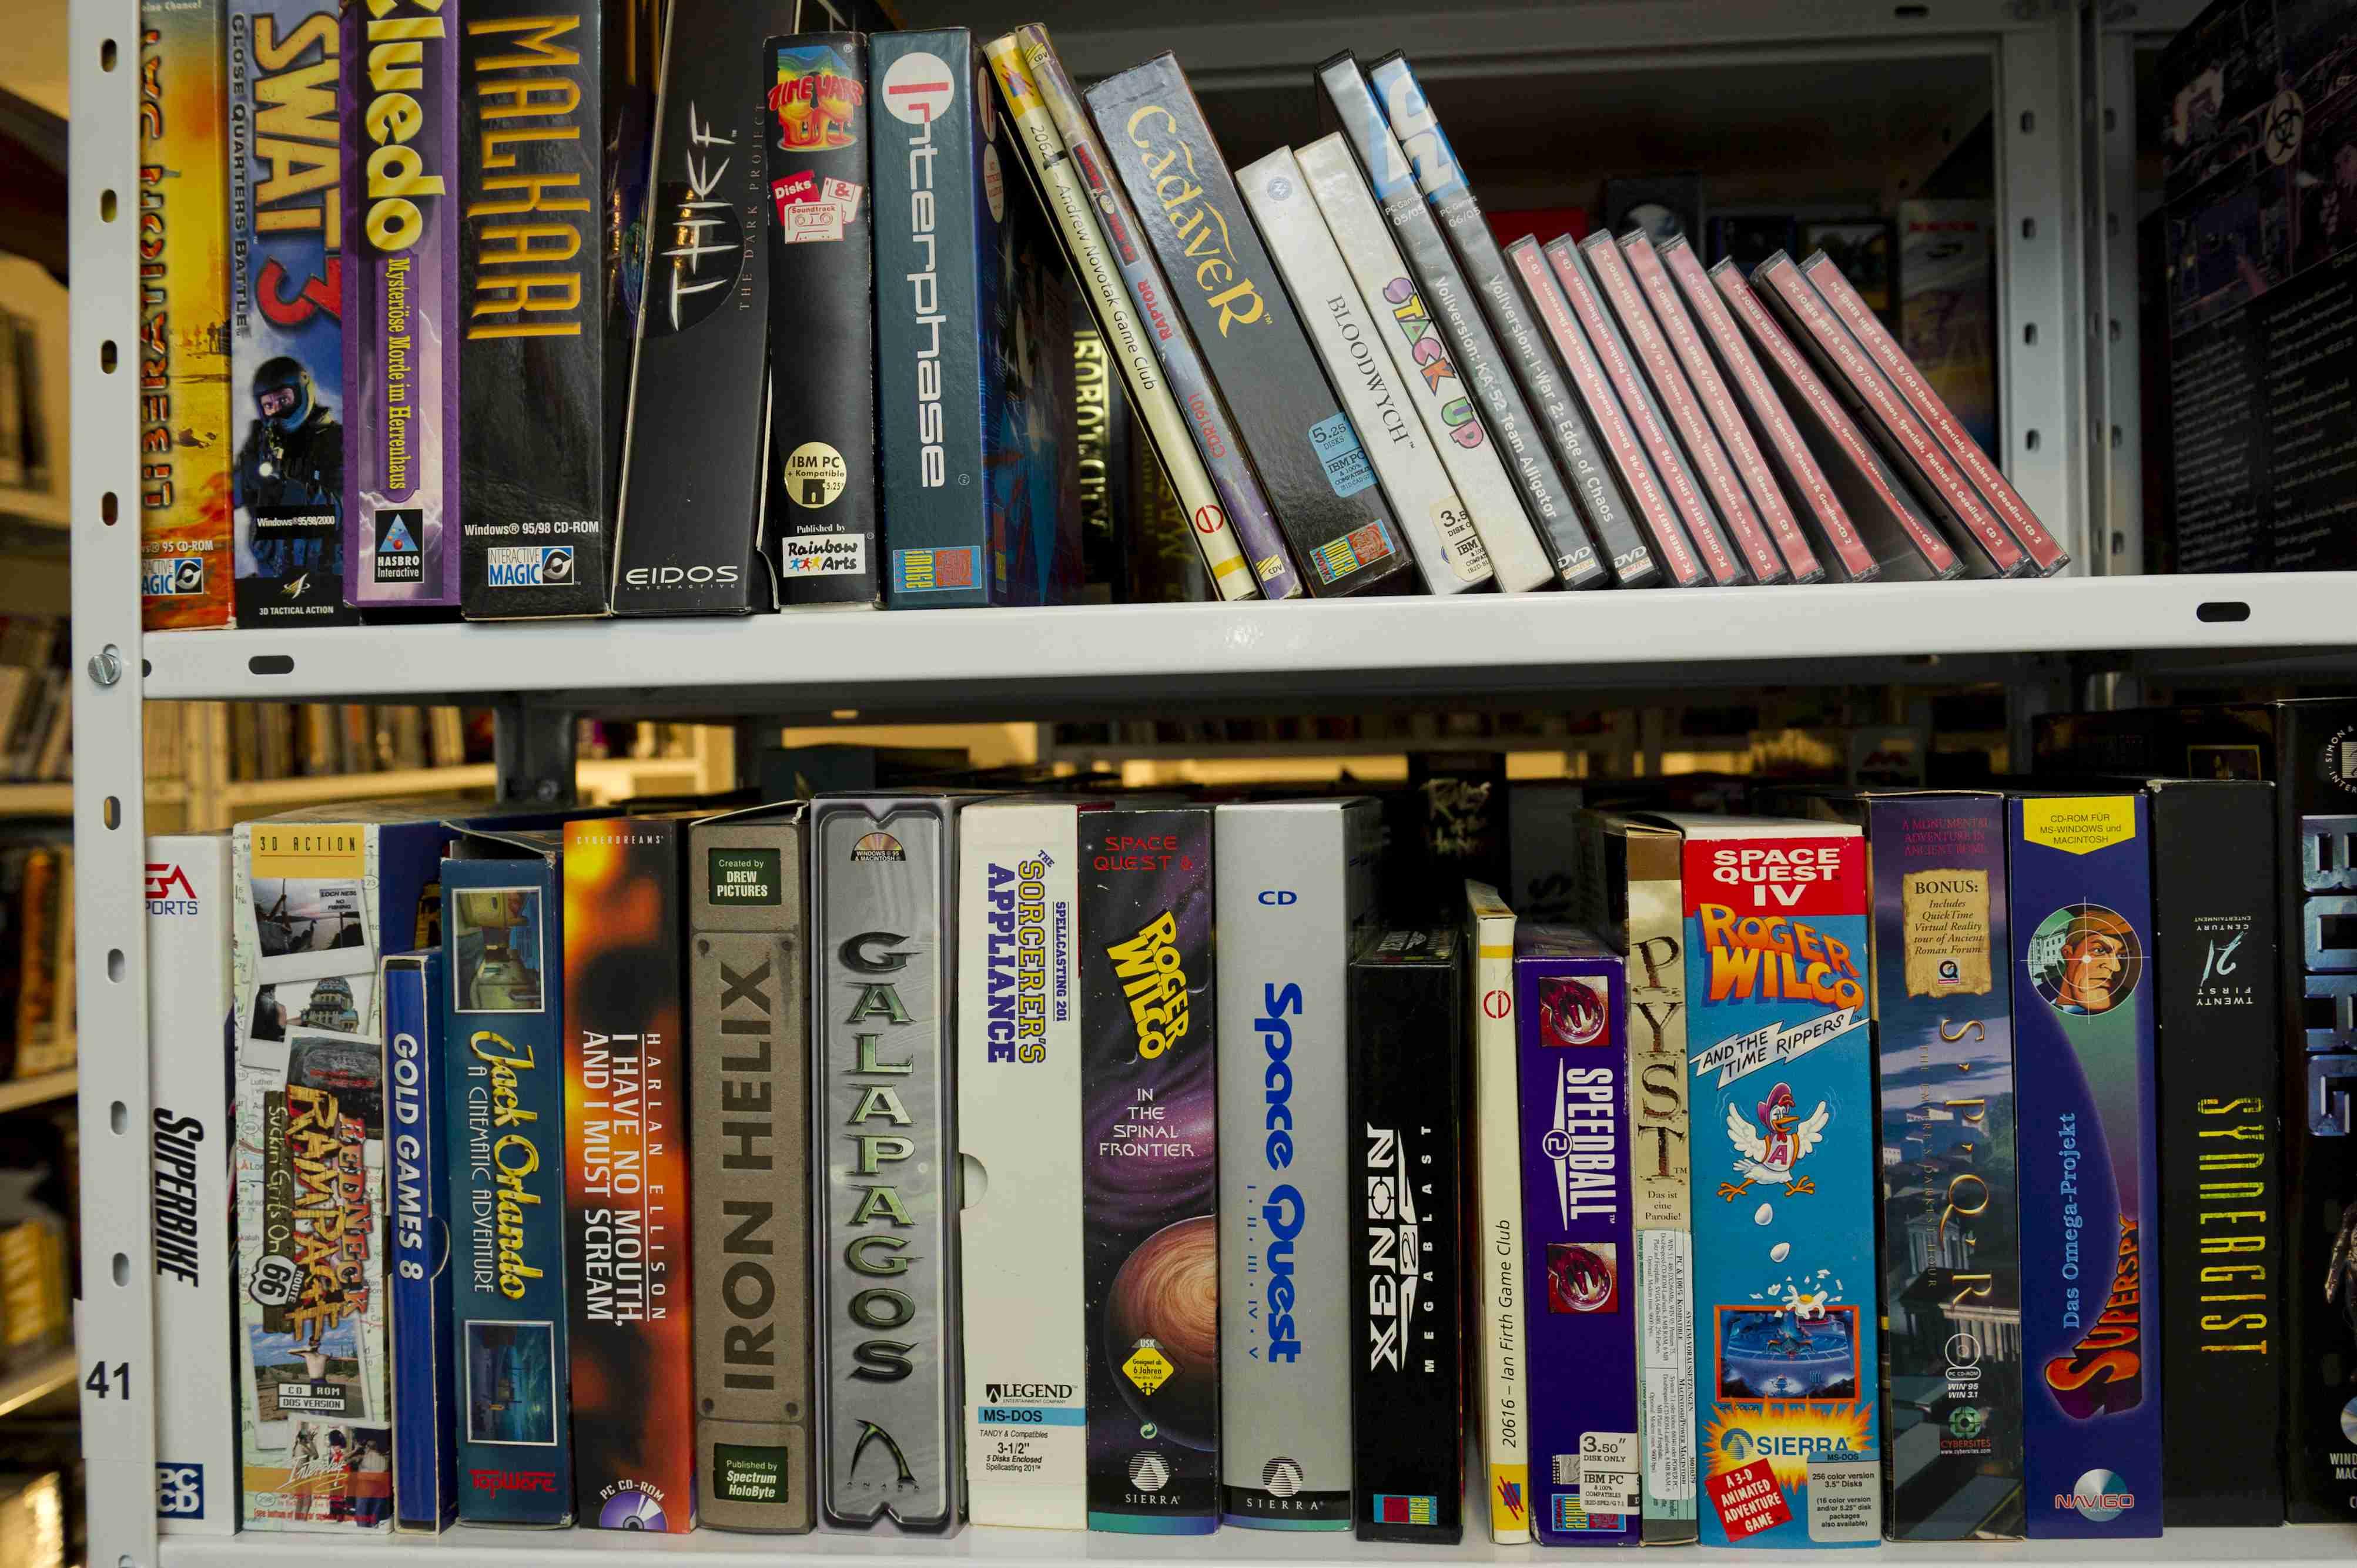 BU: Softwaresammlung des Computerspielemuseums Berlin